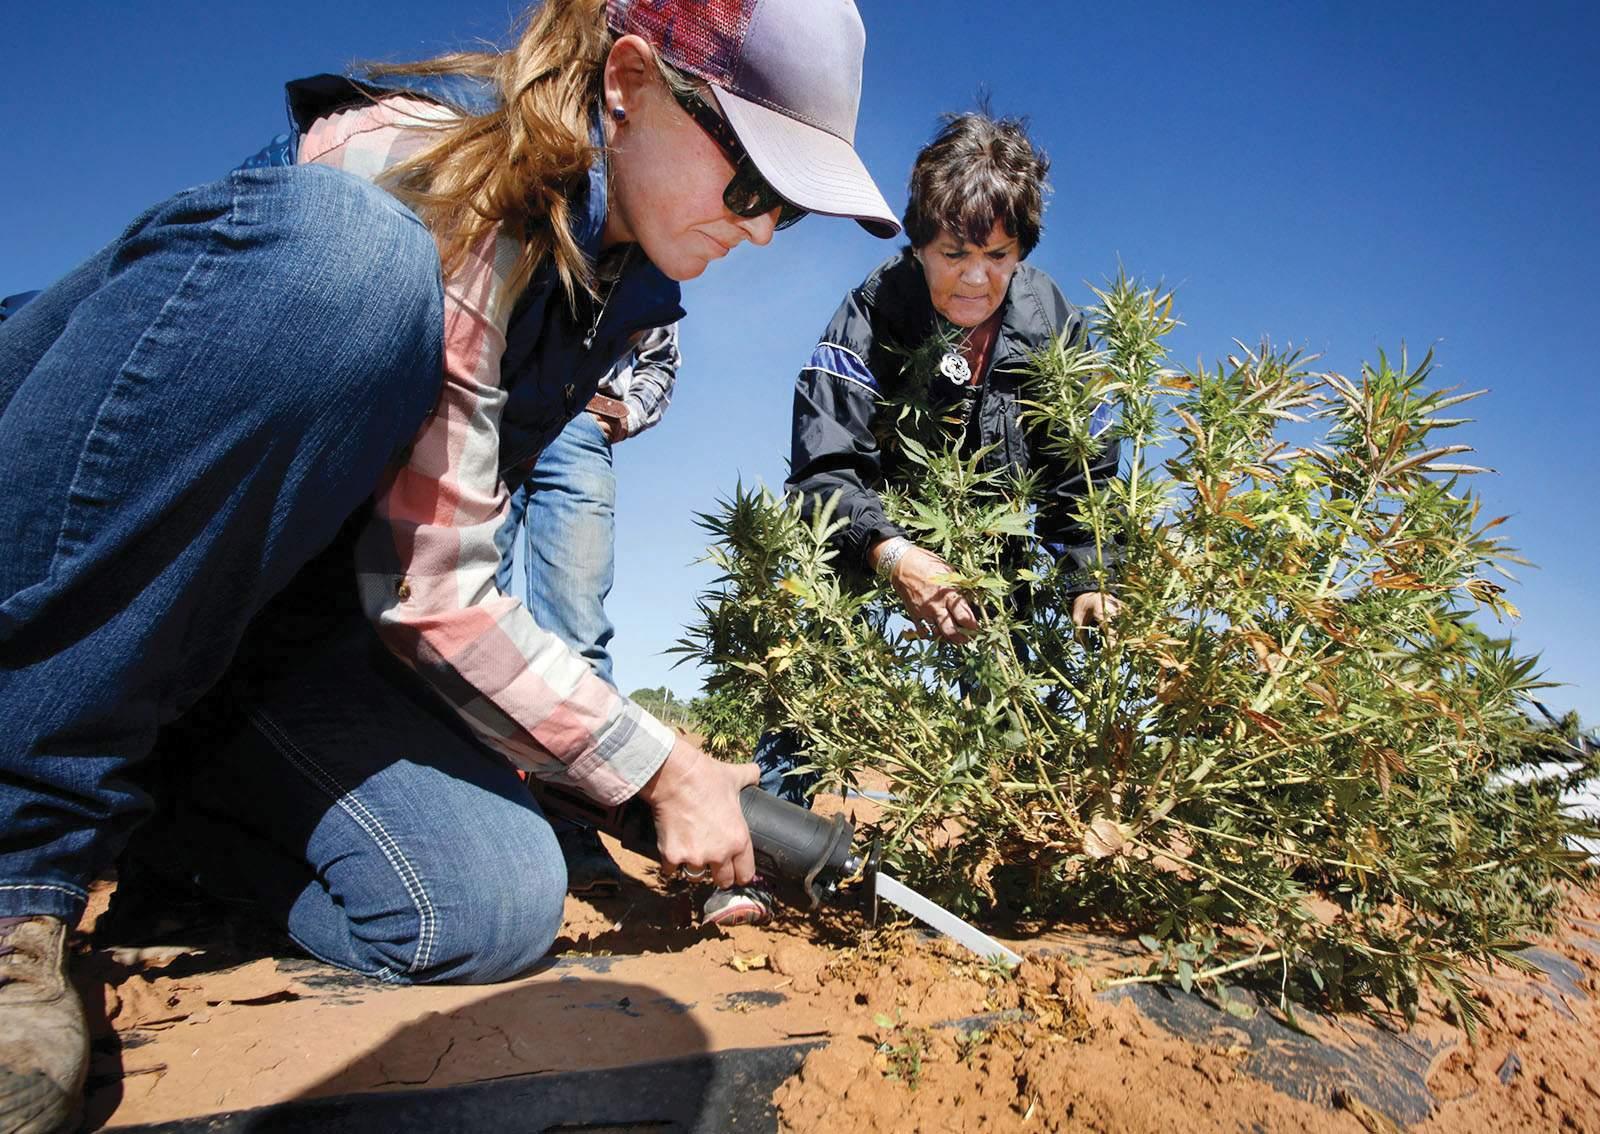 Disease, cold spring hamper hemp rush - The Durango Herald